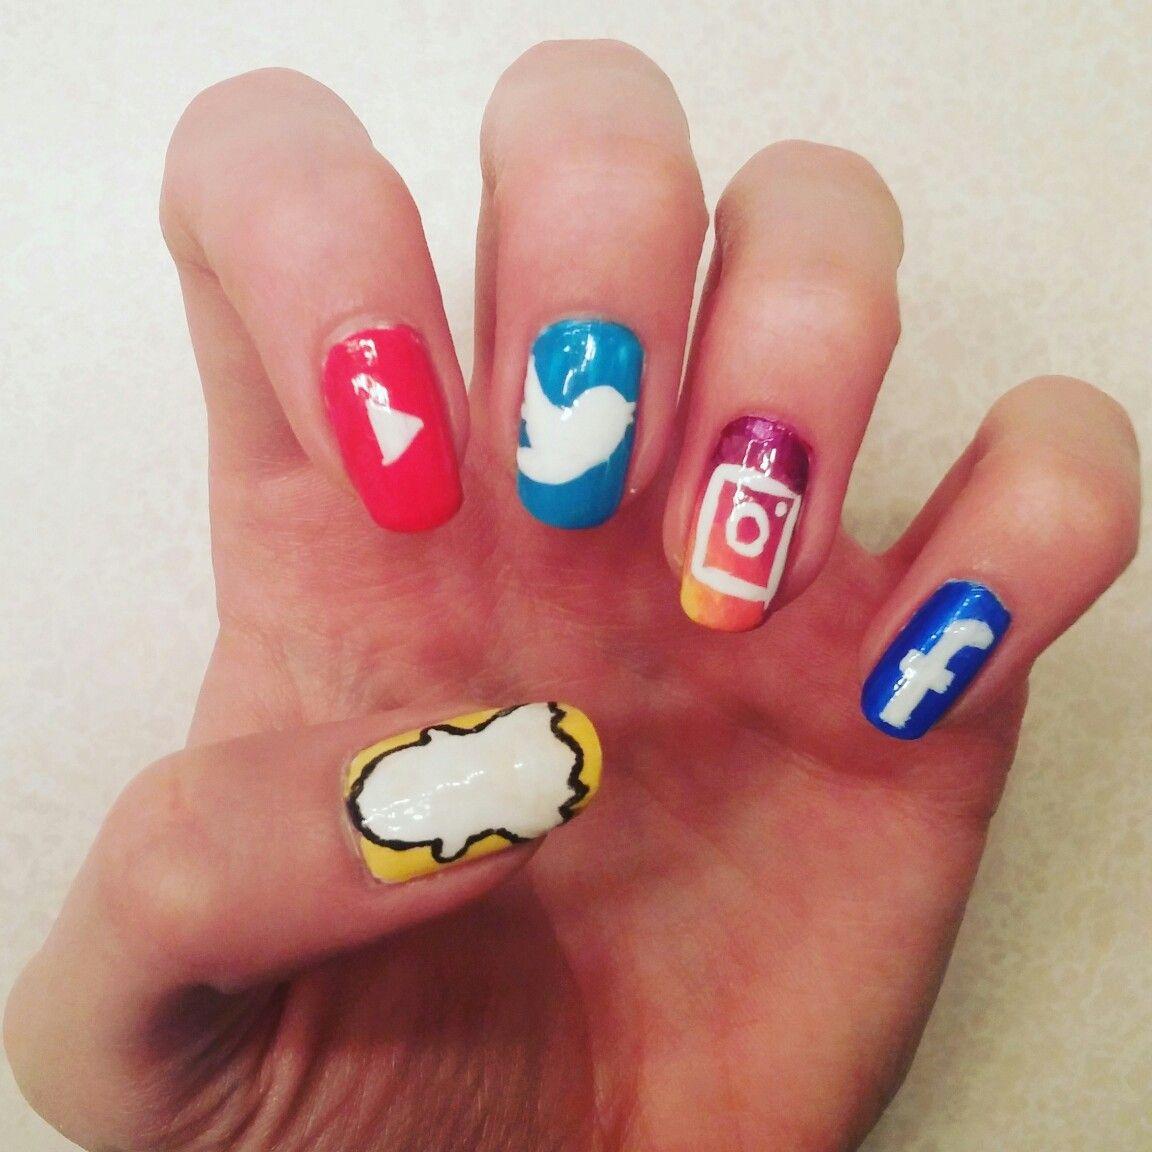 Social Media Nails #nailart #nerdnails #socialmedia #youtube ...